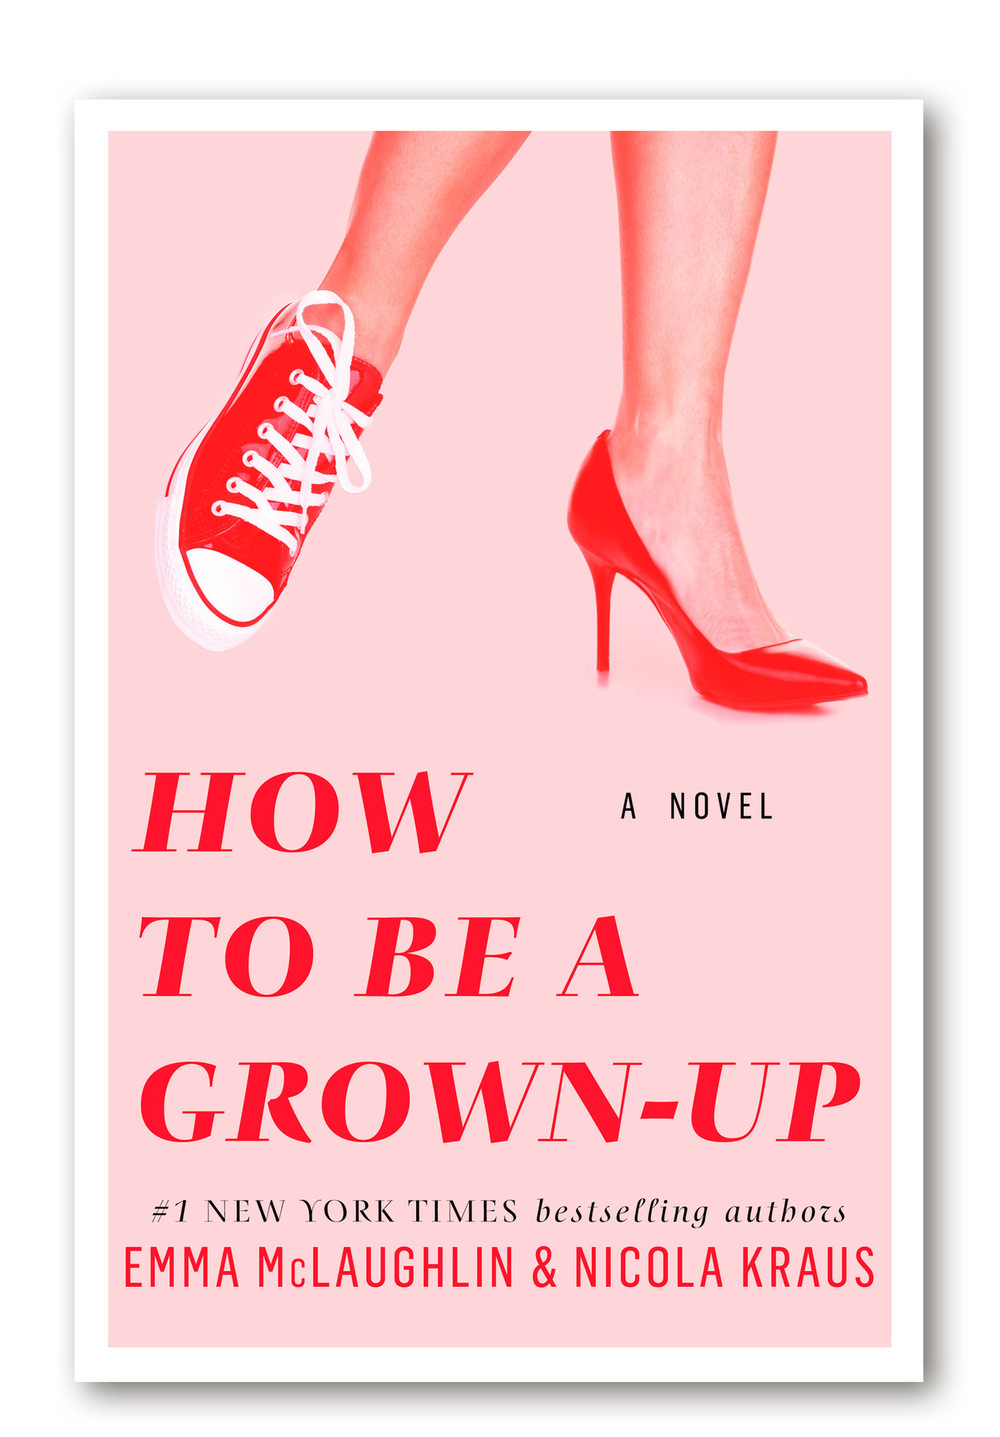 Chelsea McGuckin Design - Atria Books, July 2015